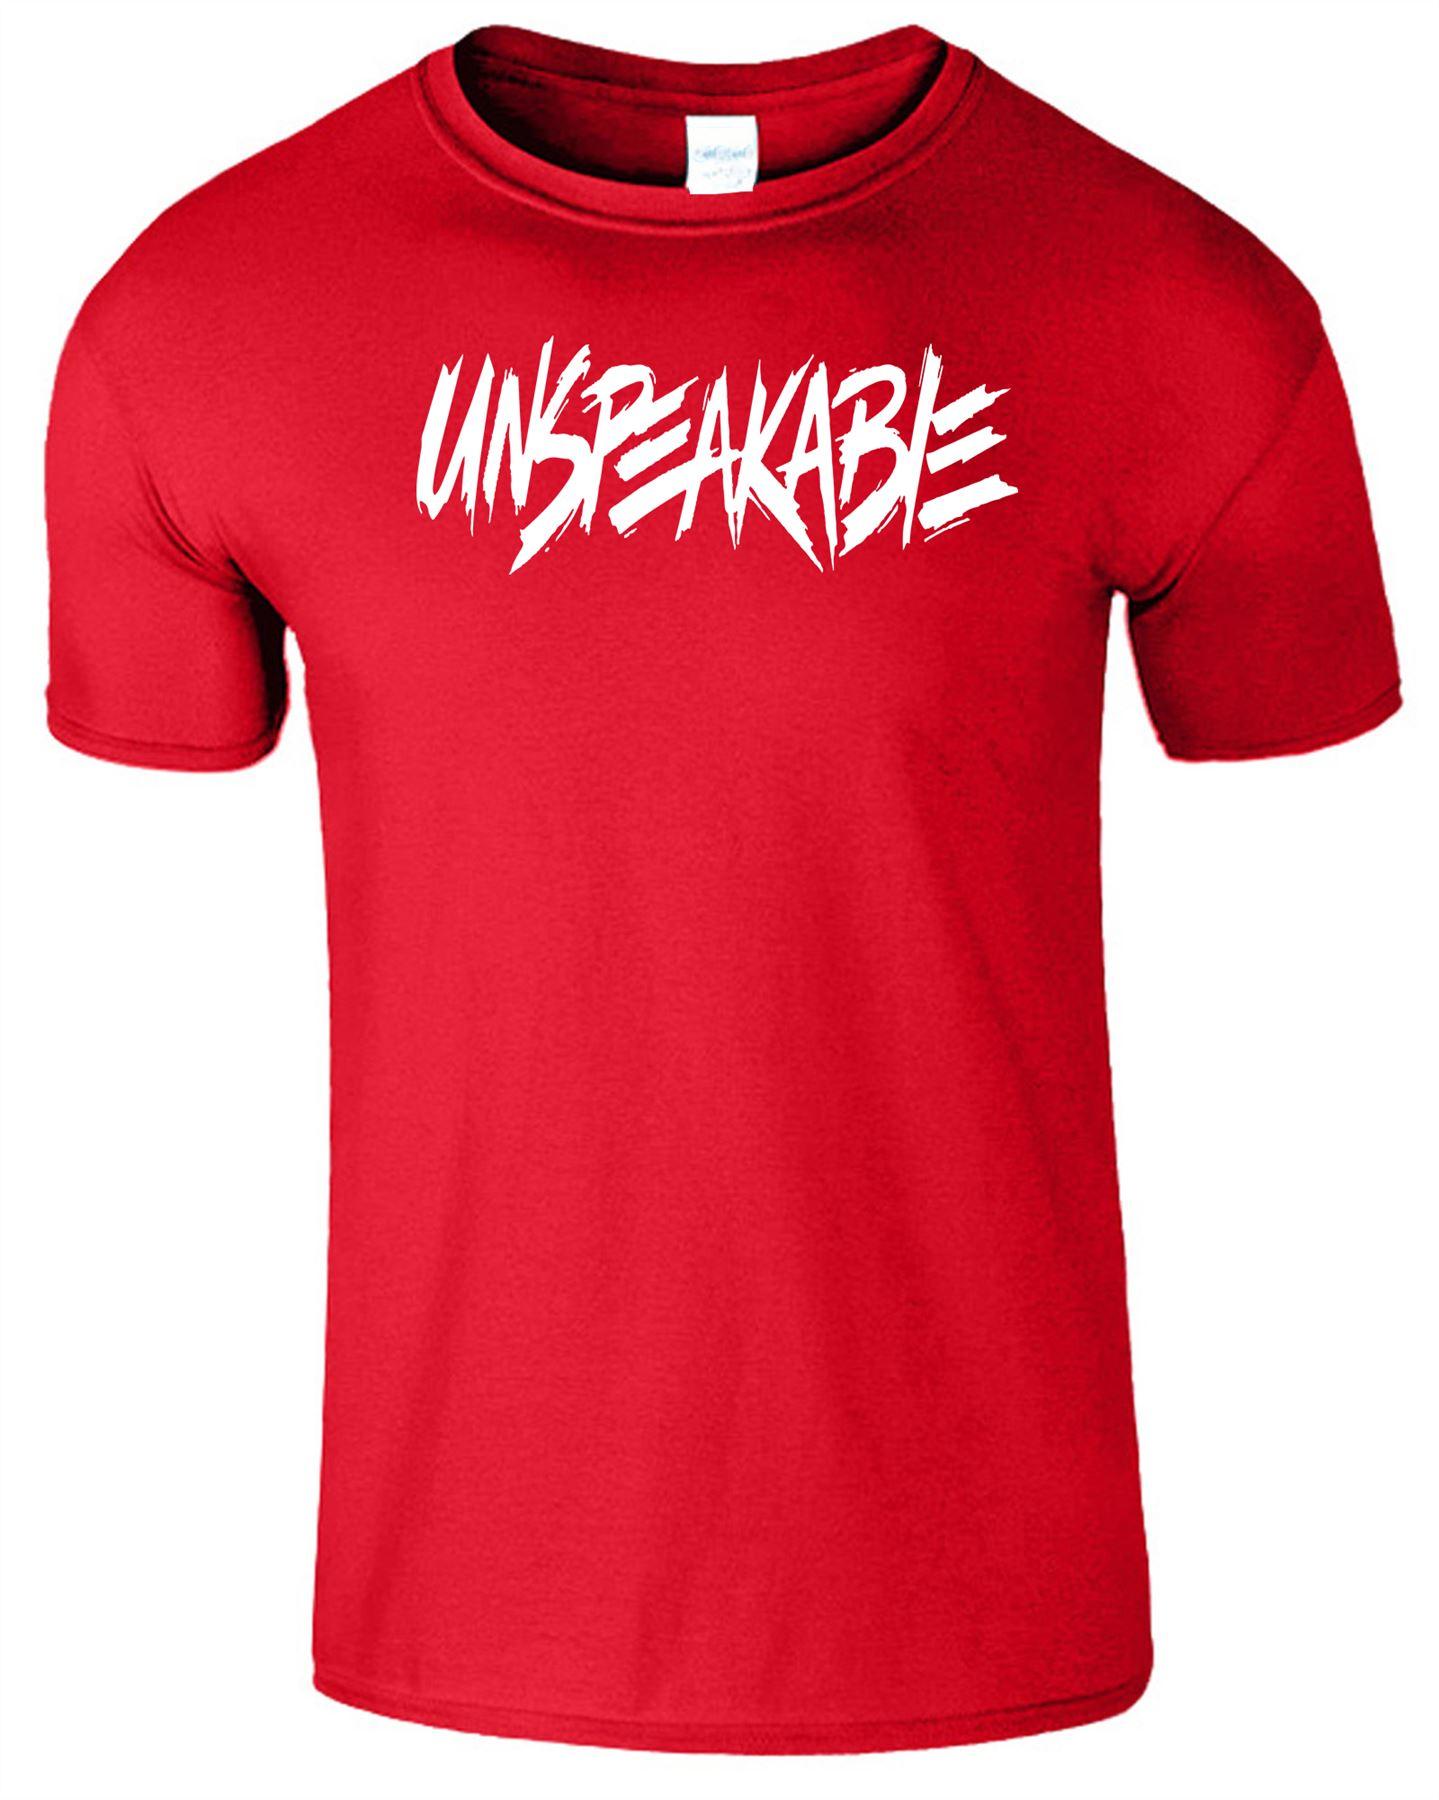 Unspeakable Mens Kids T-Shirt Youtube Gaming Lovers Boys Girls Unisex Top Shirt